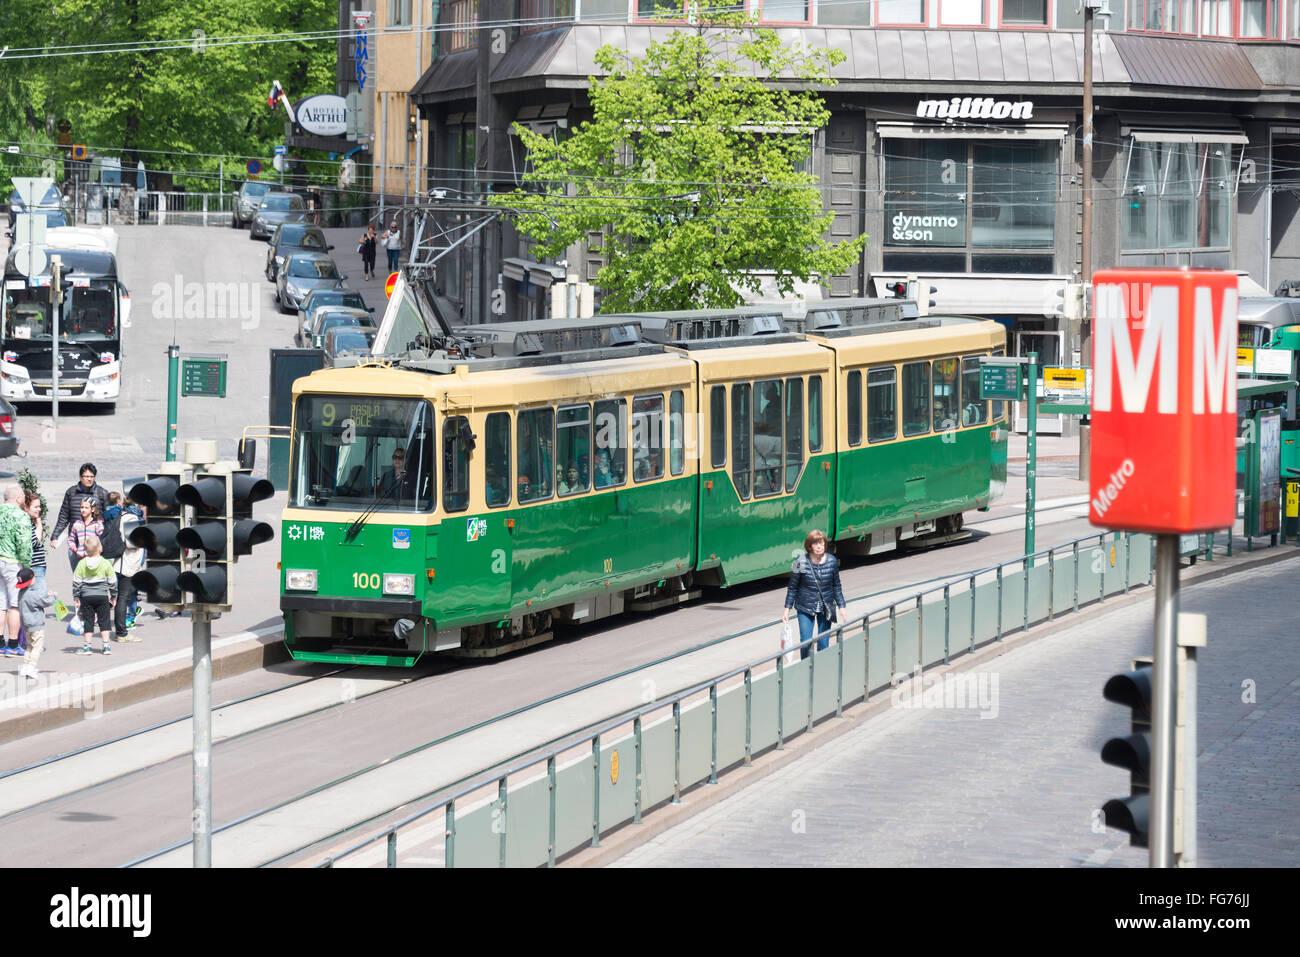 Metro tram in city centre, Vuorikatu, Helsinki, Uusimaa Region, Republic of Finland Stock Photo